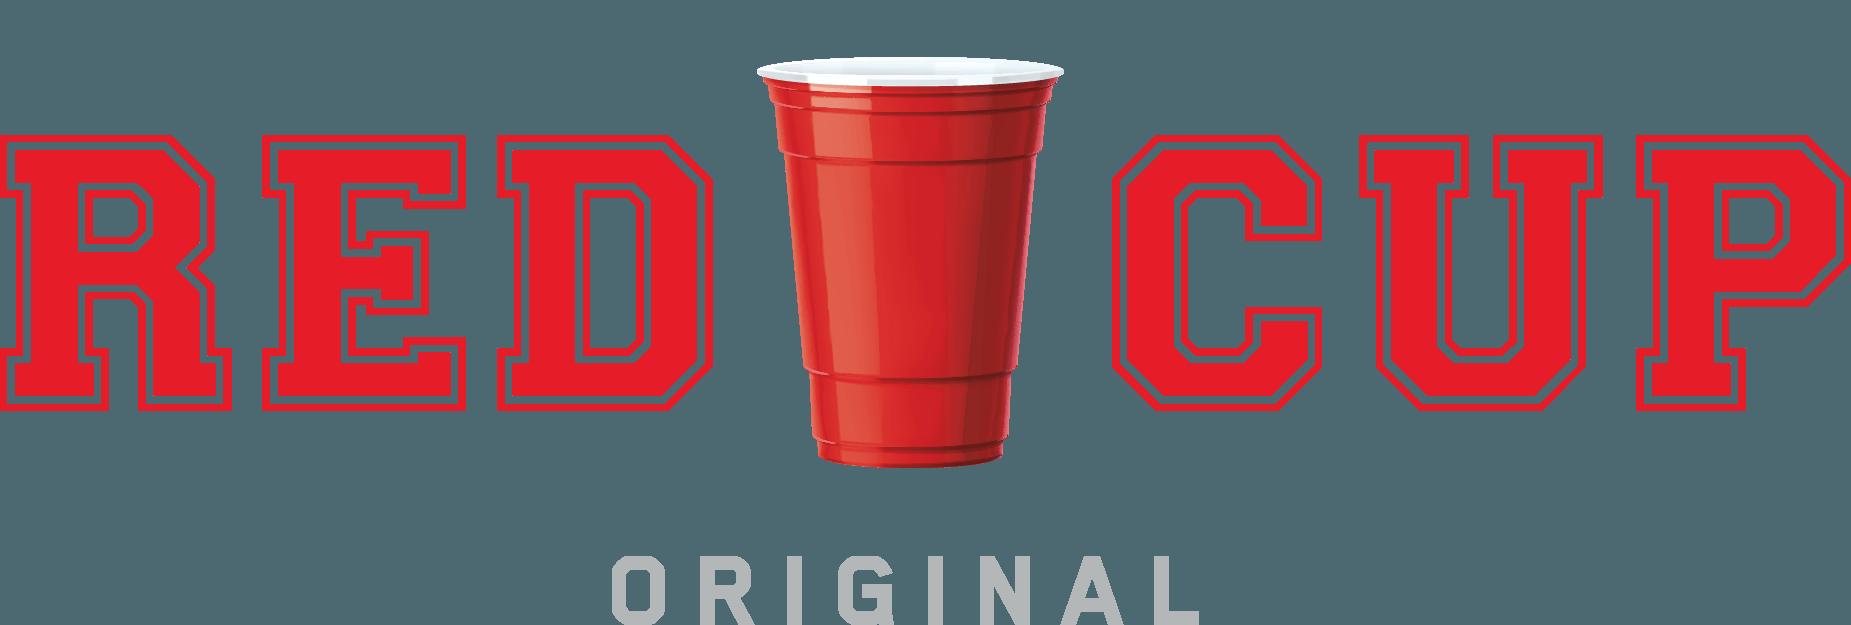 RED CUP Original®